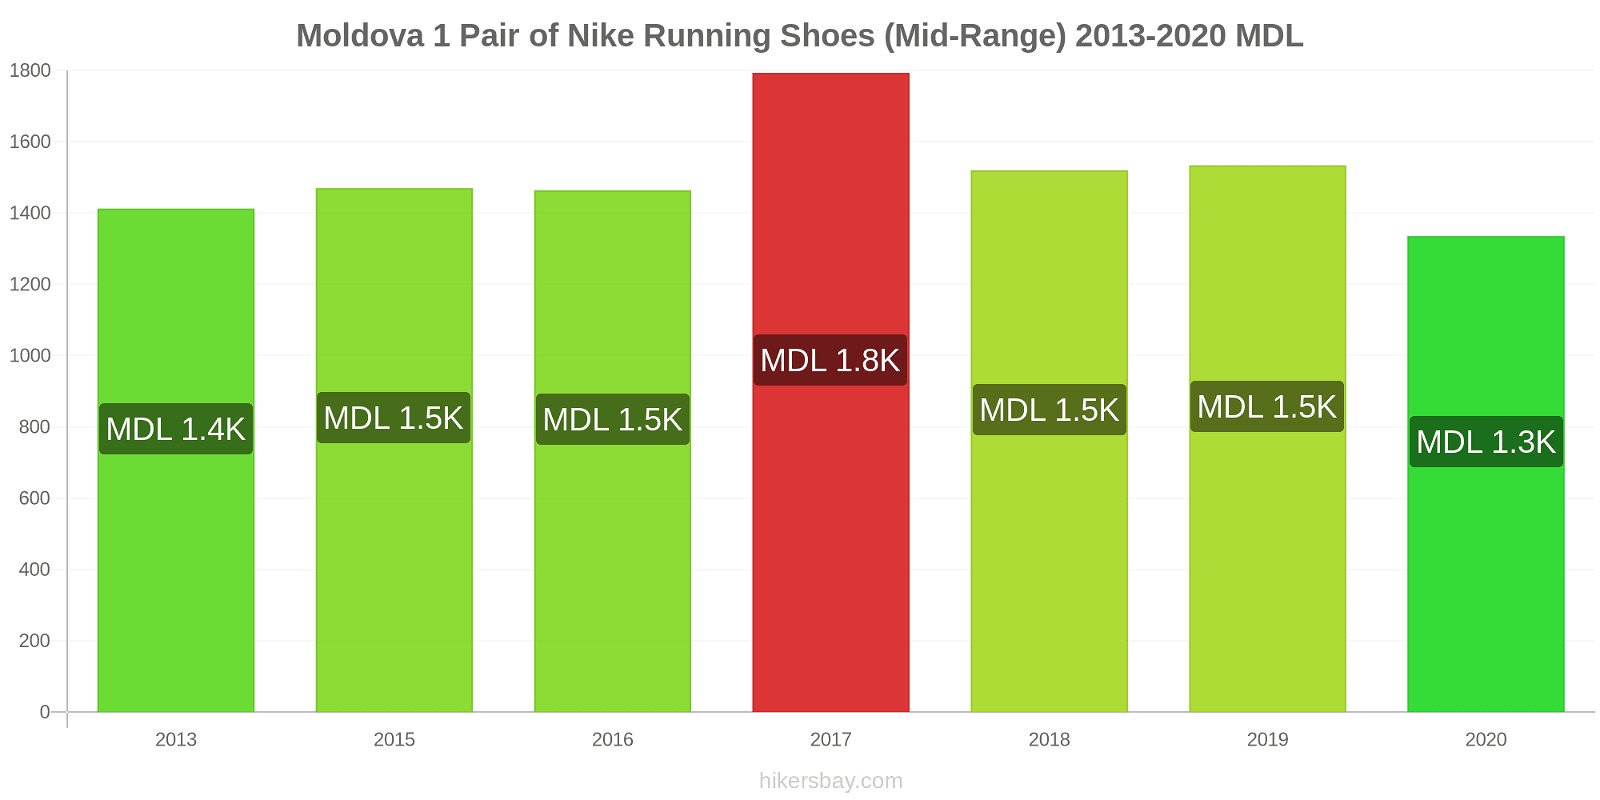 Moldova price changes 1 Pair of Nike Running Shoes (Mid-Range) hikersbay.com